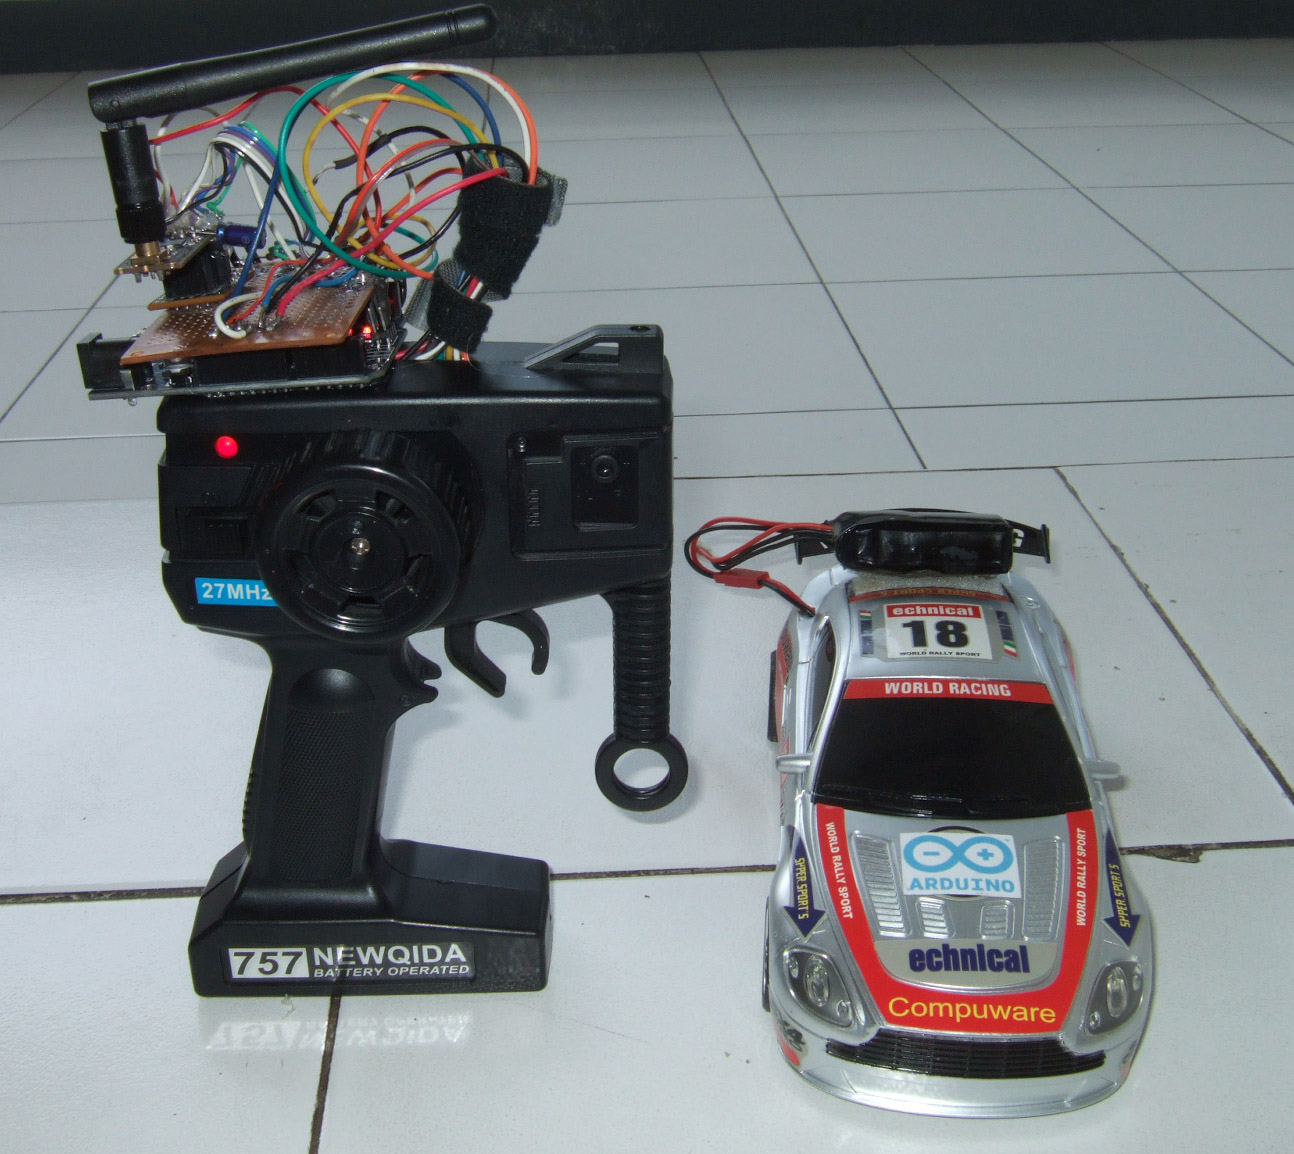 Hobby Witch: How to hack RC CAR via Arduino nRF24L01 2 4G